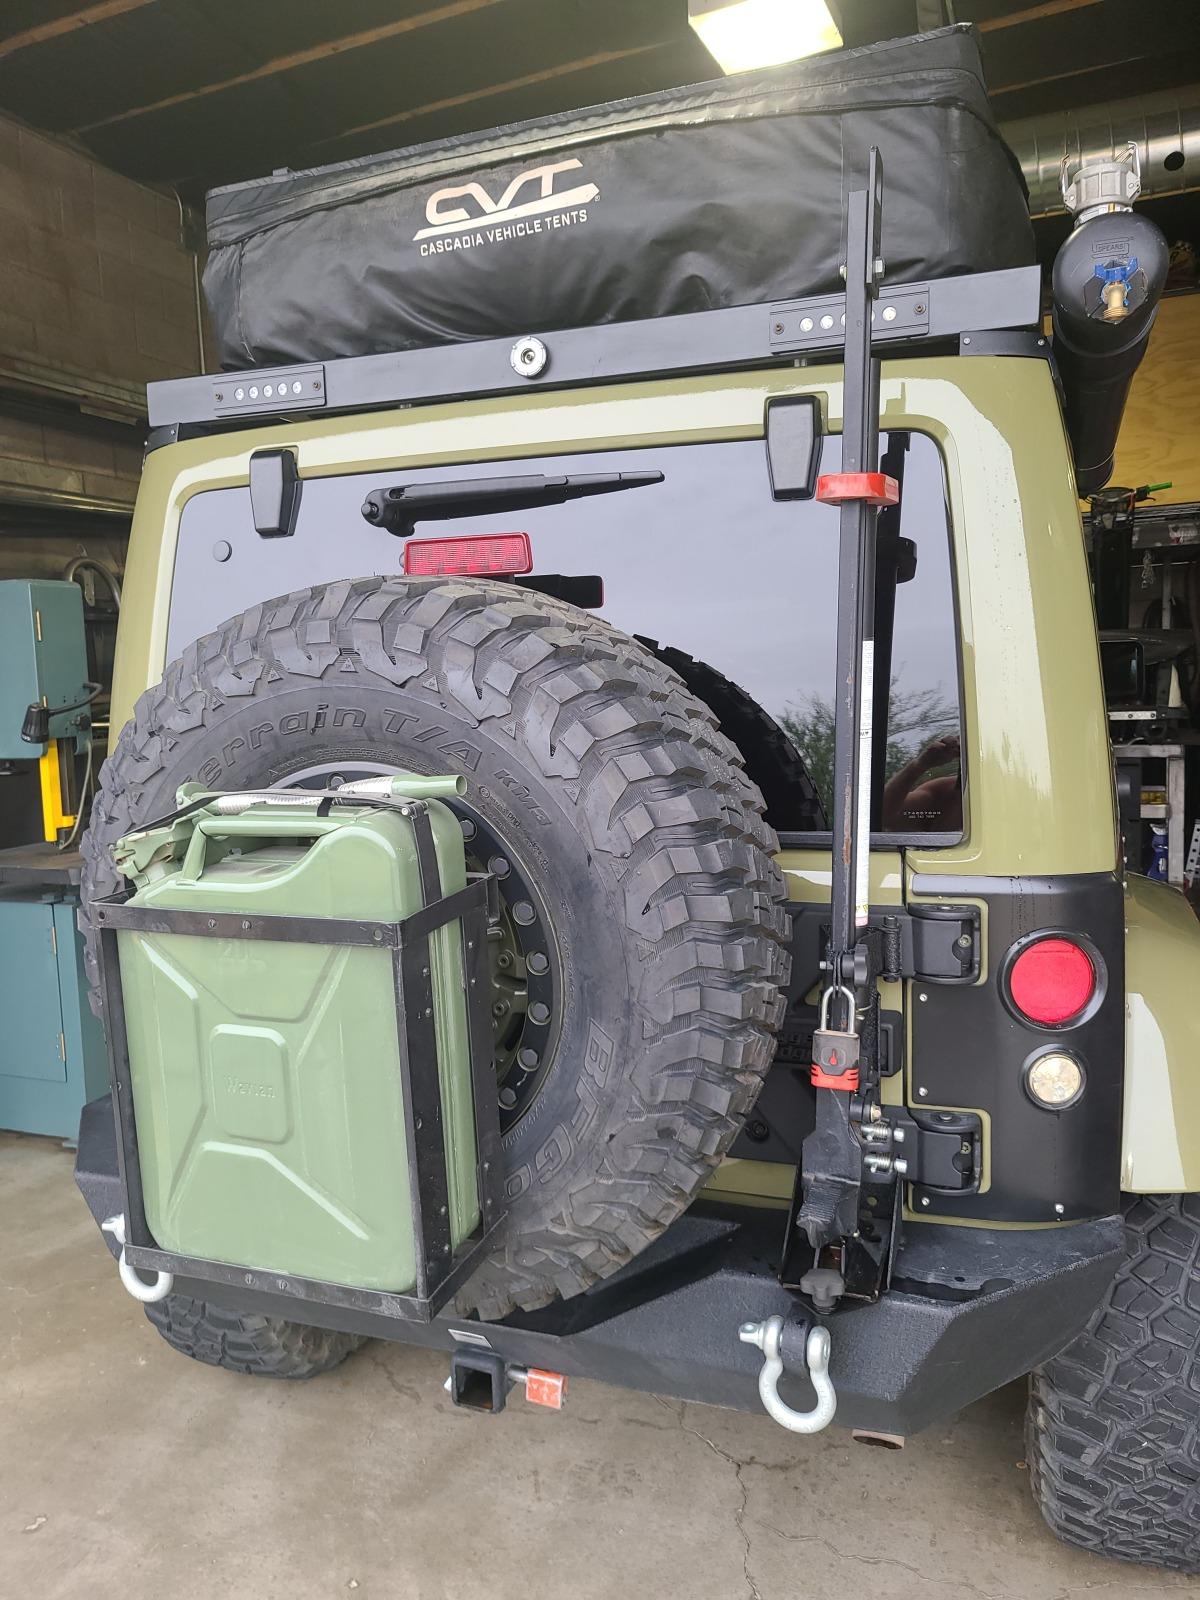 For Sale: 2013 jeep wrangler j/k oscar Mike freedom edition - photo2